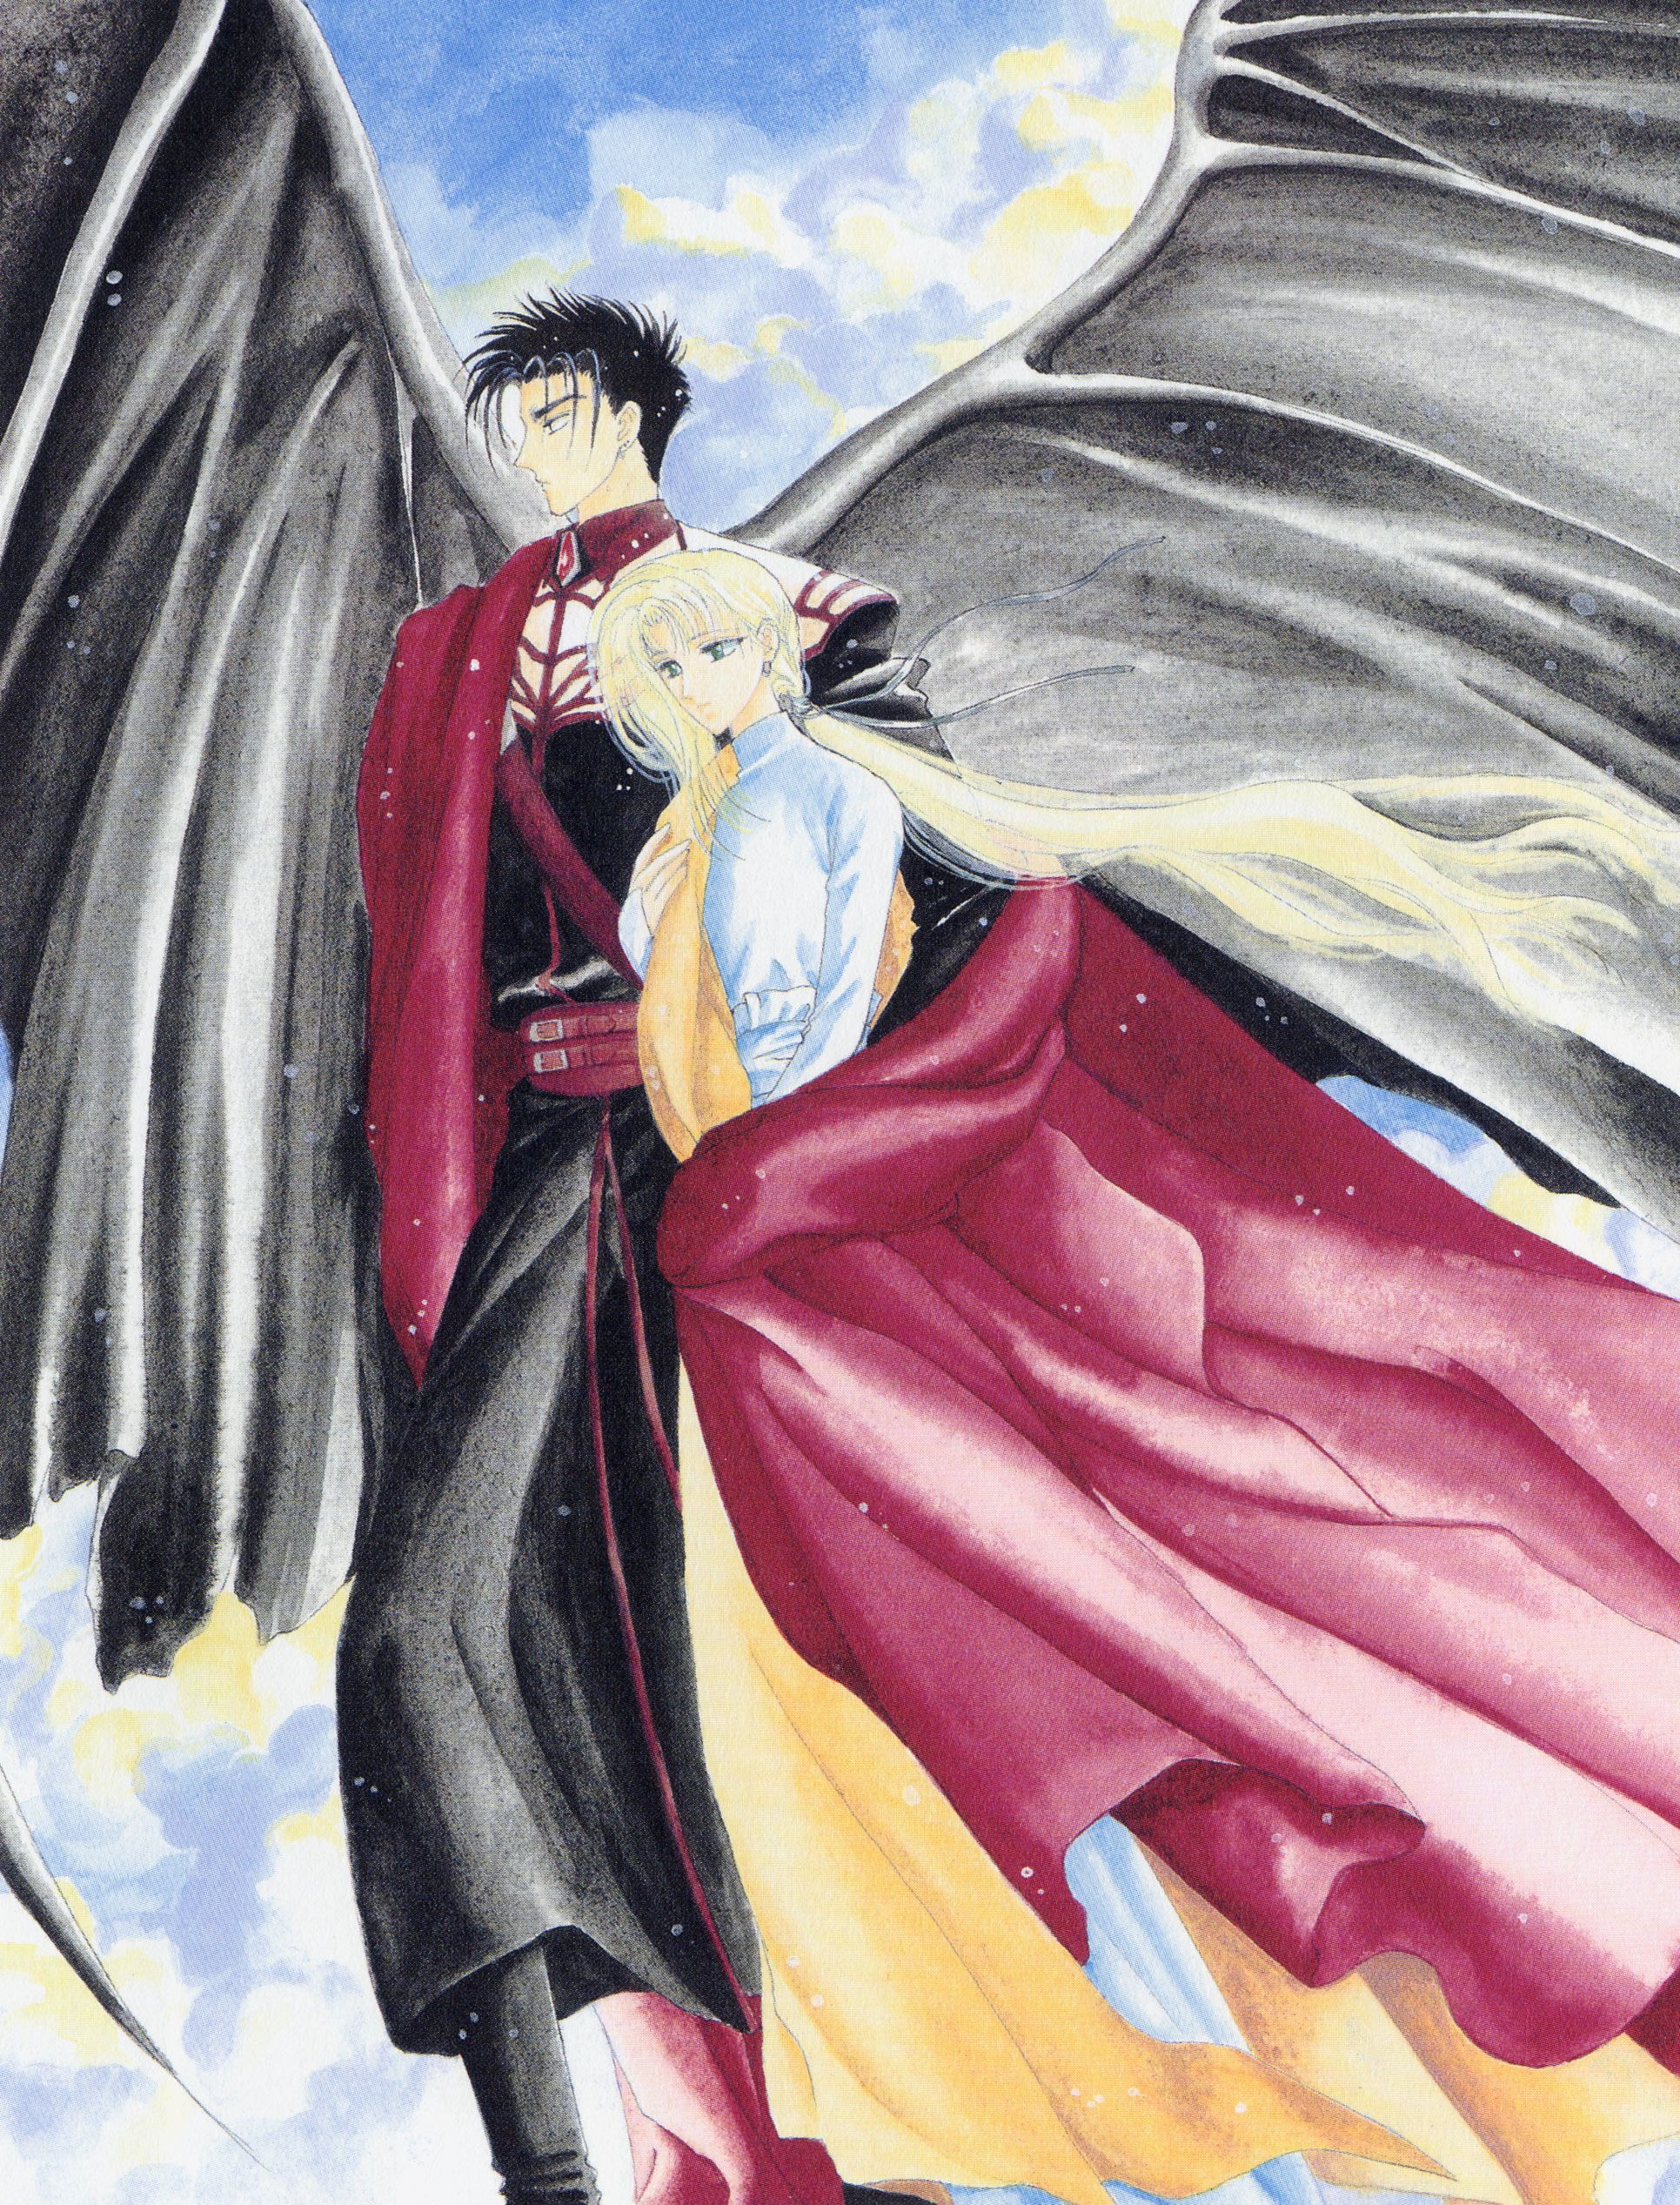 Wish/55719 Zerochan Anime, Anime images, Anime artwork